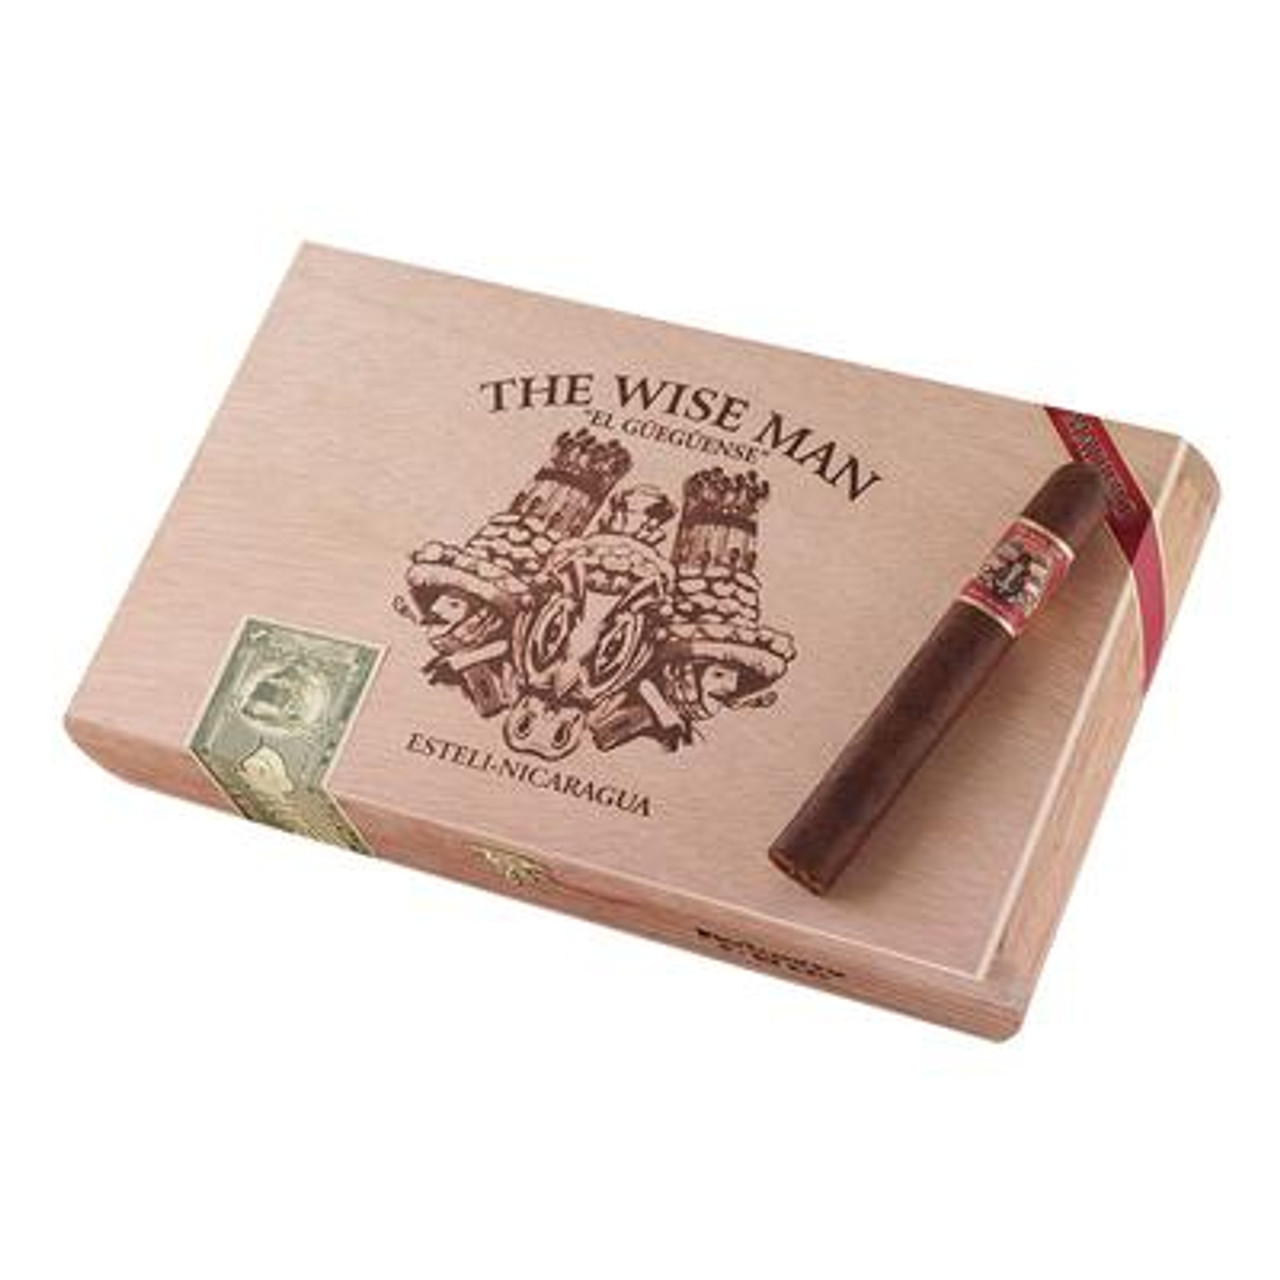 Wise Man Maduro Robusto Cigars - 5.5 x 50 (Box of 25)